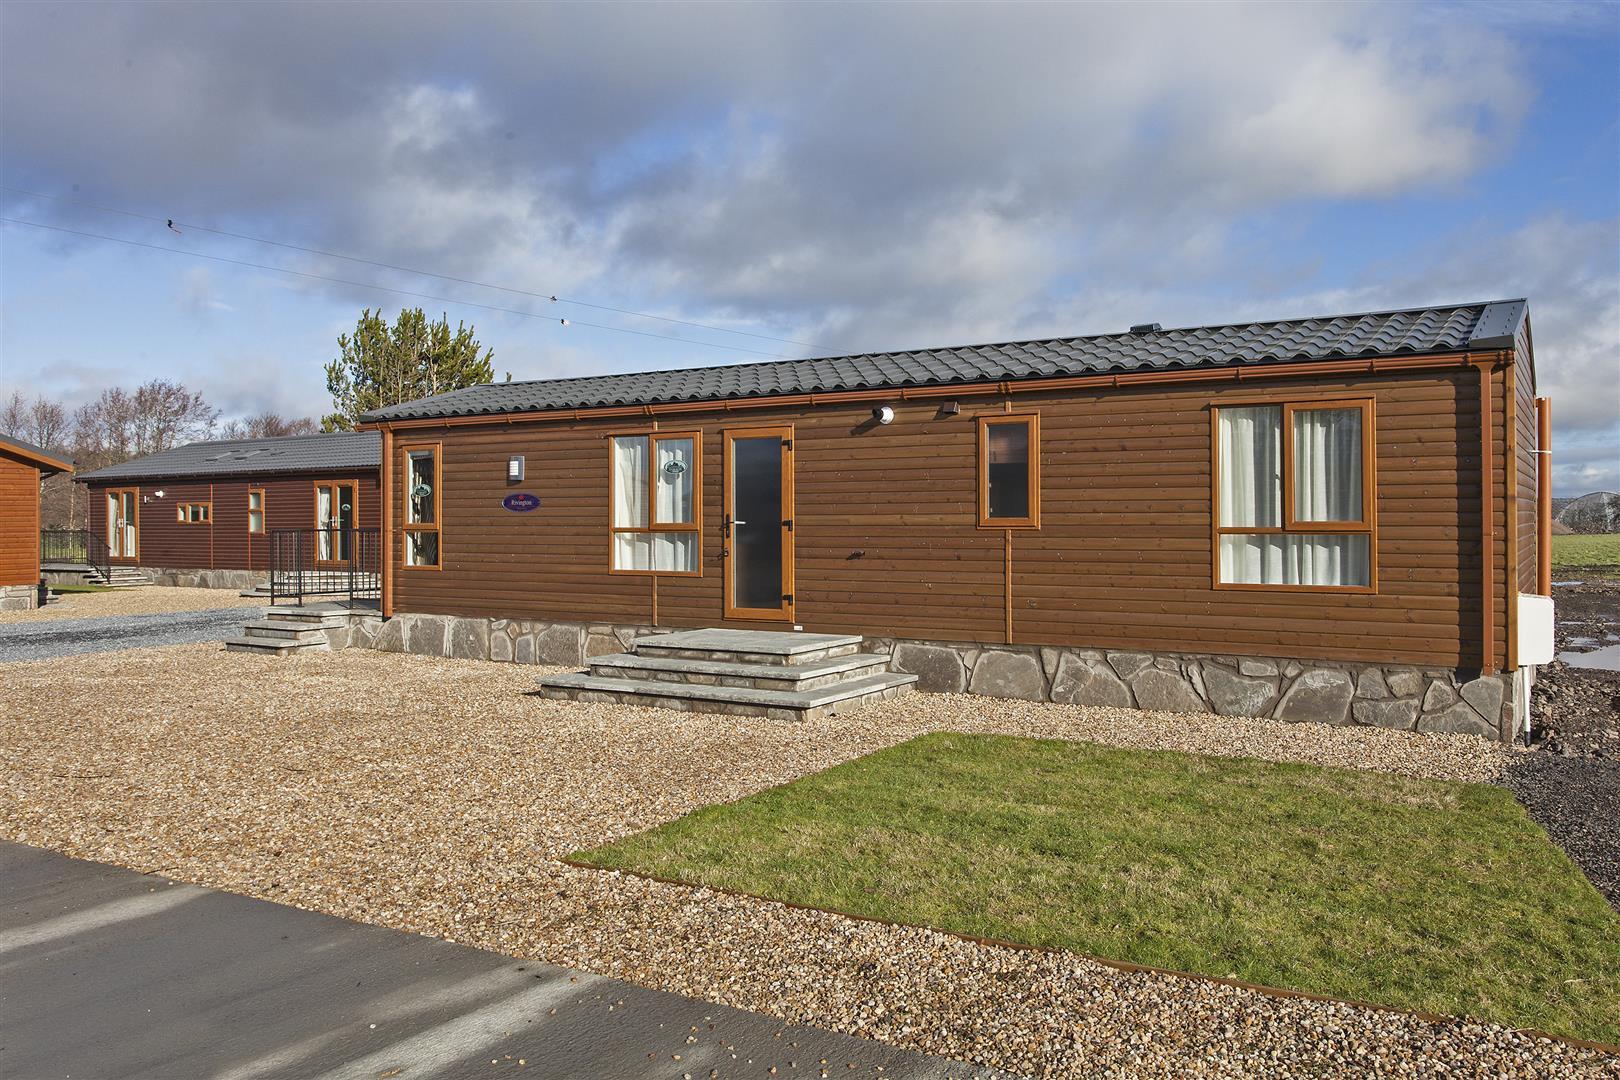 Plot 26 pemberton rivington lodge lochmanor lodge next for Pemberton cabins